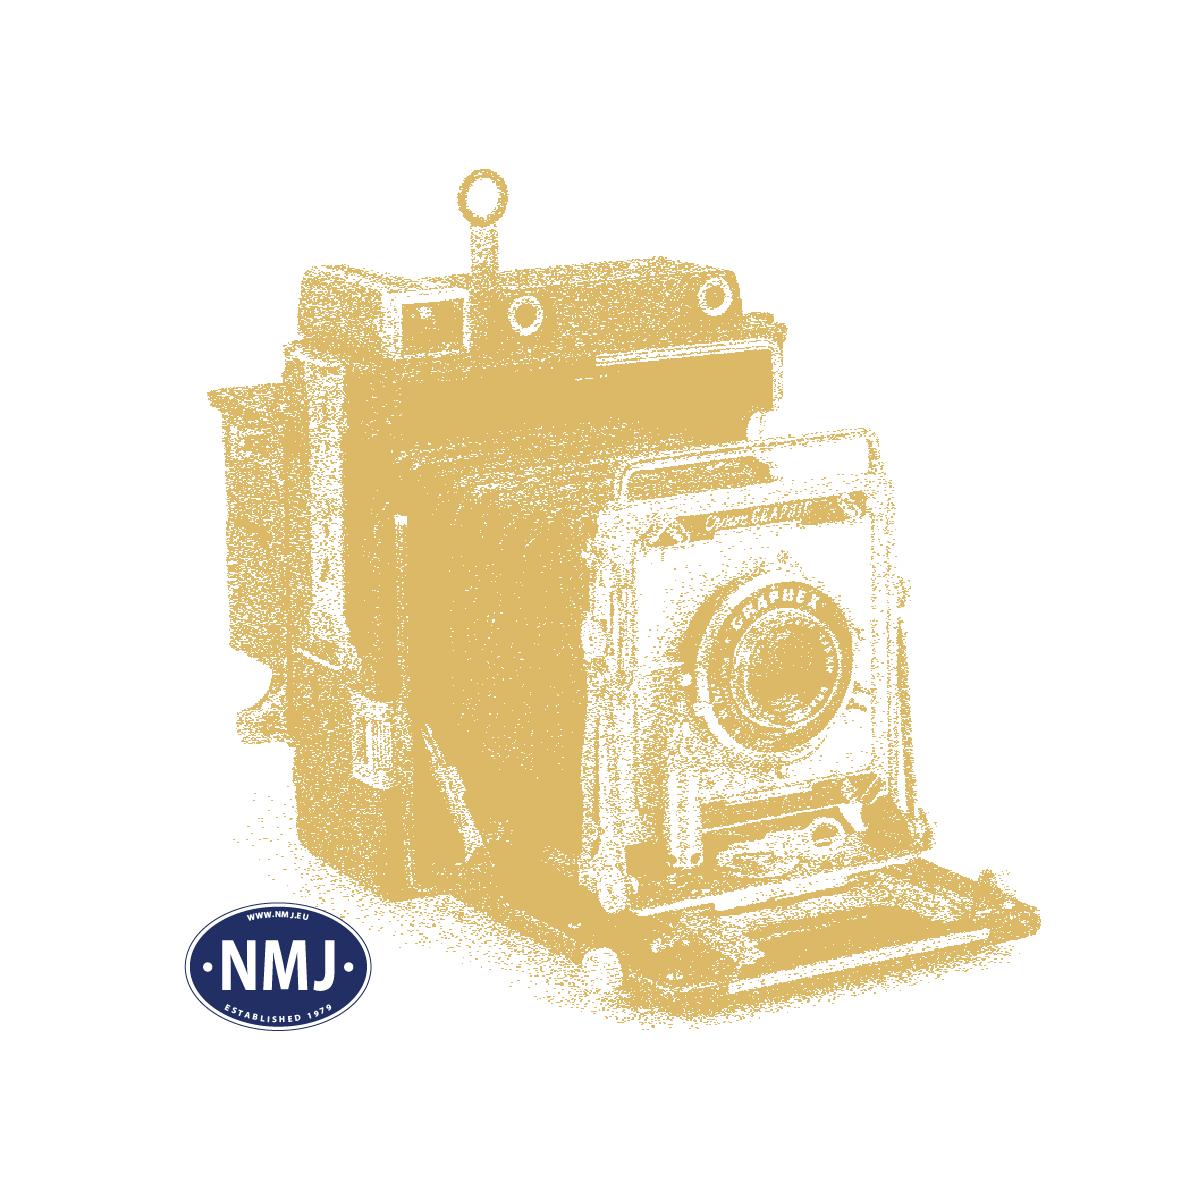 NMJT122.209 - NMJ Topline NSB B7 27036 Nydesign